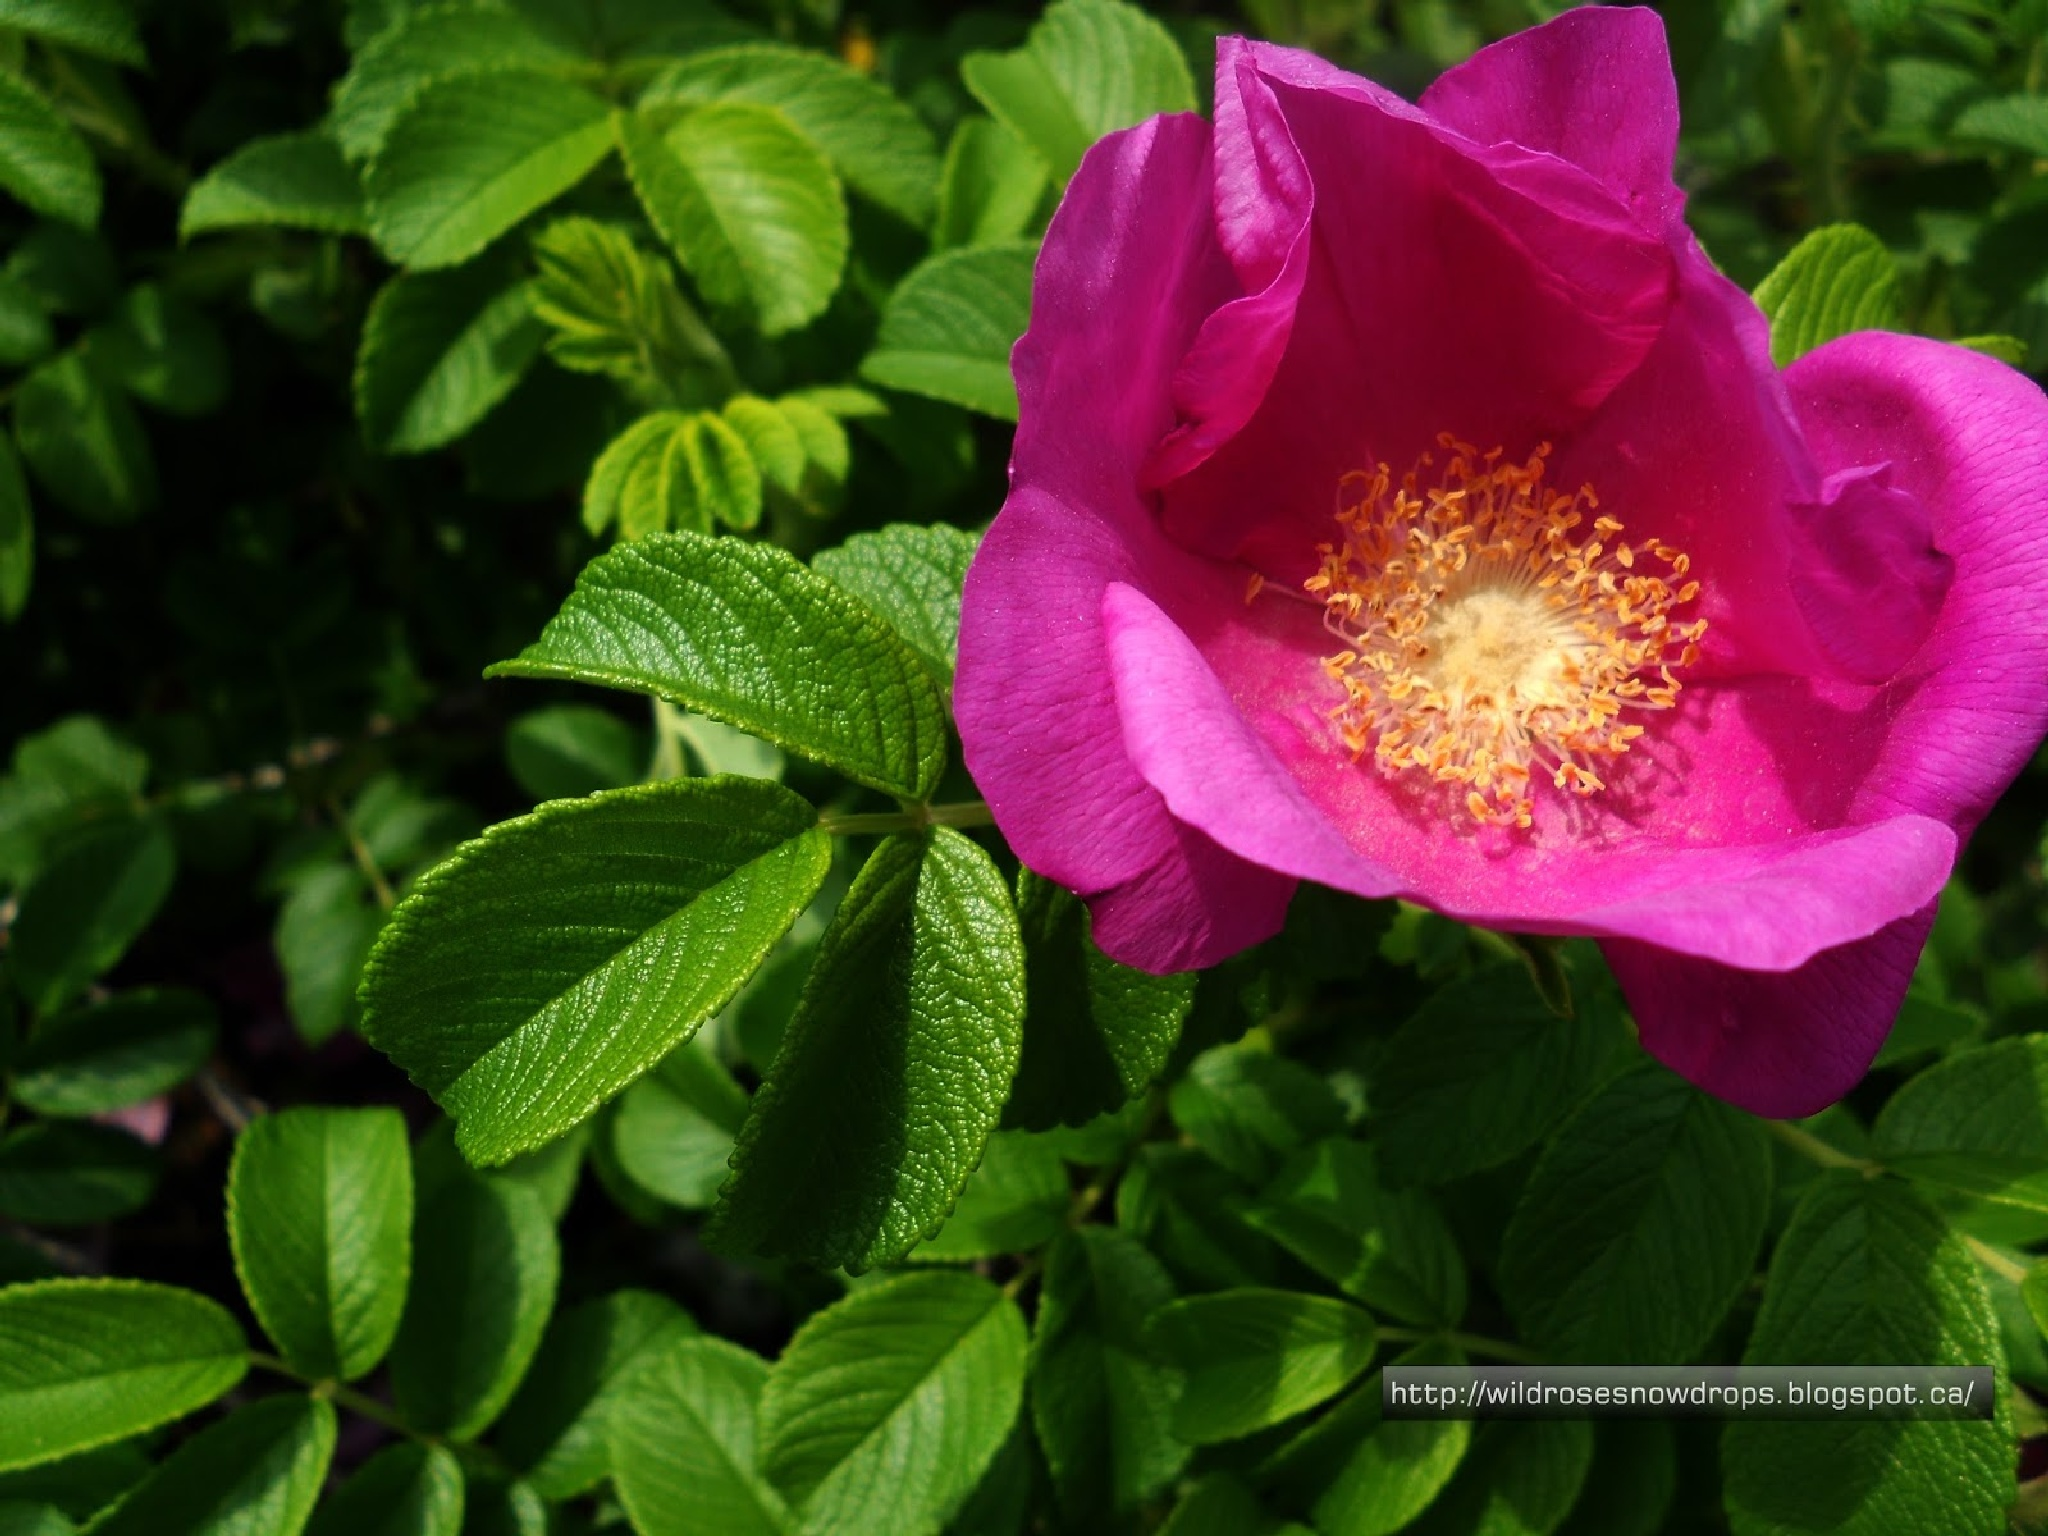 Wildrose by WildRoseSnowDrop